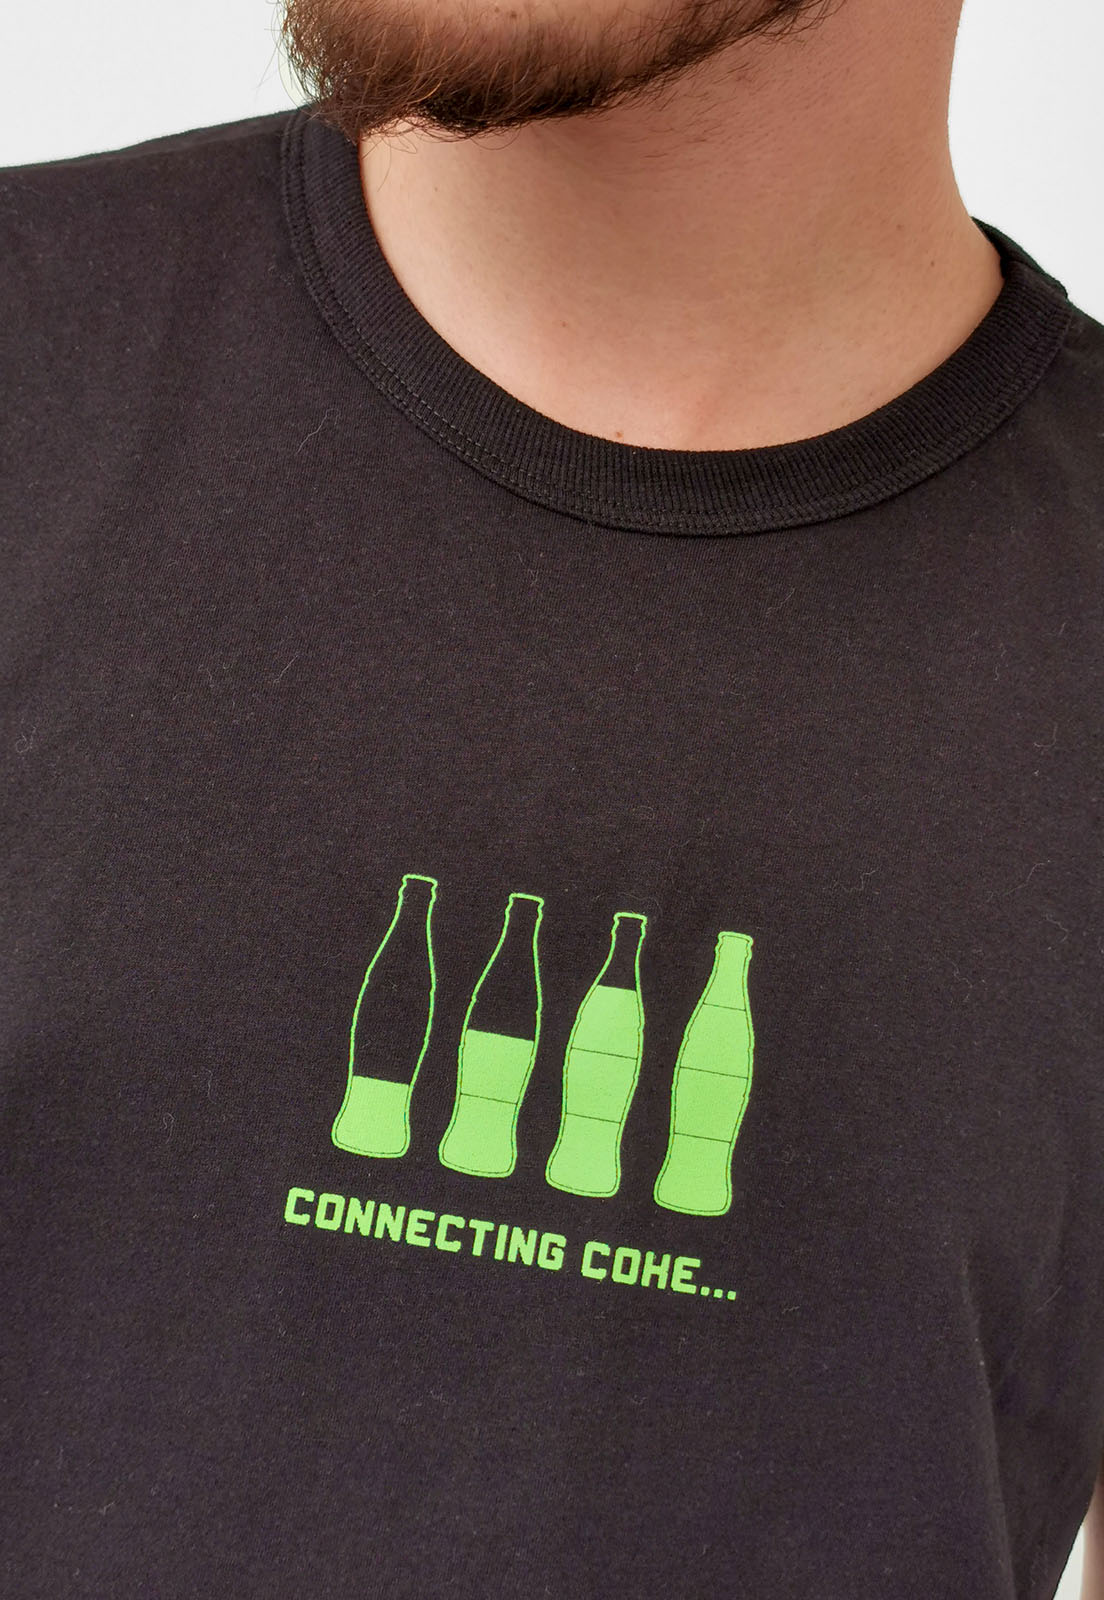 Camiseta Coca-Cola Preto Connecting